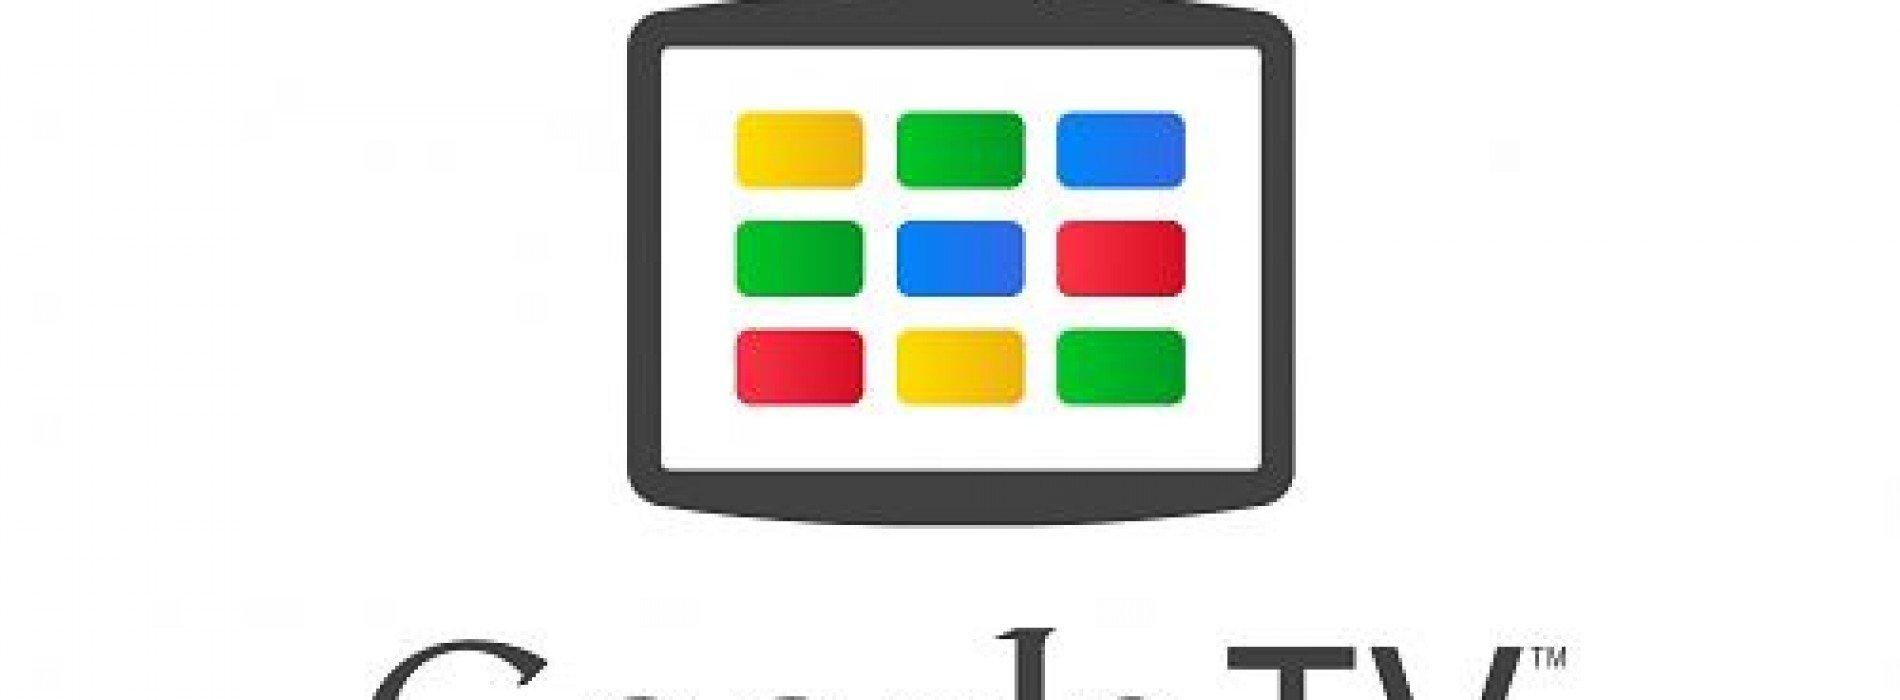 Google showcasing new Google TV sets at CES